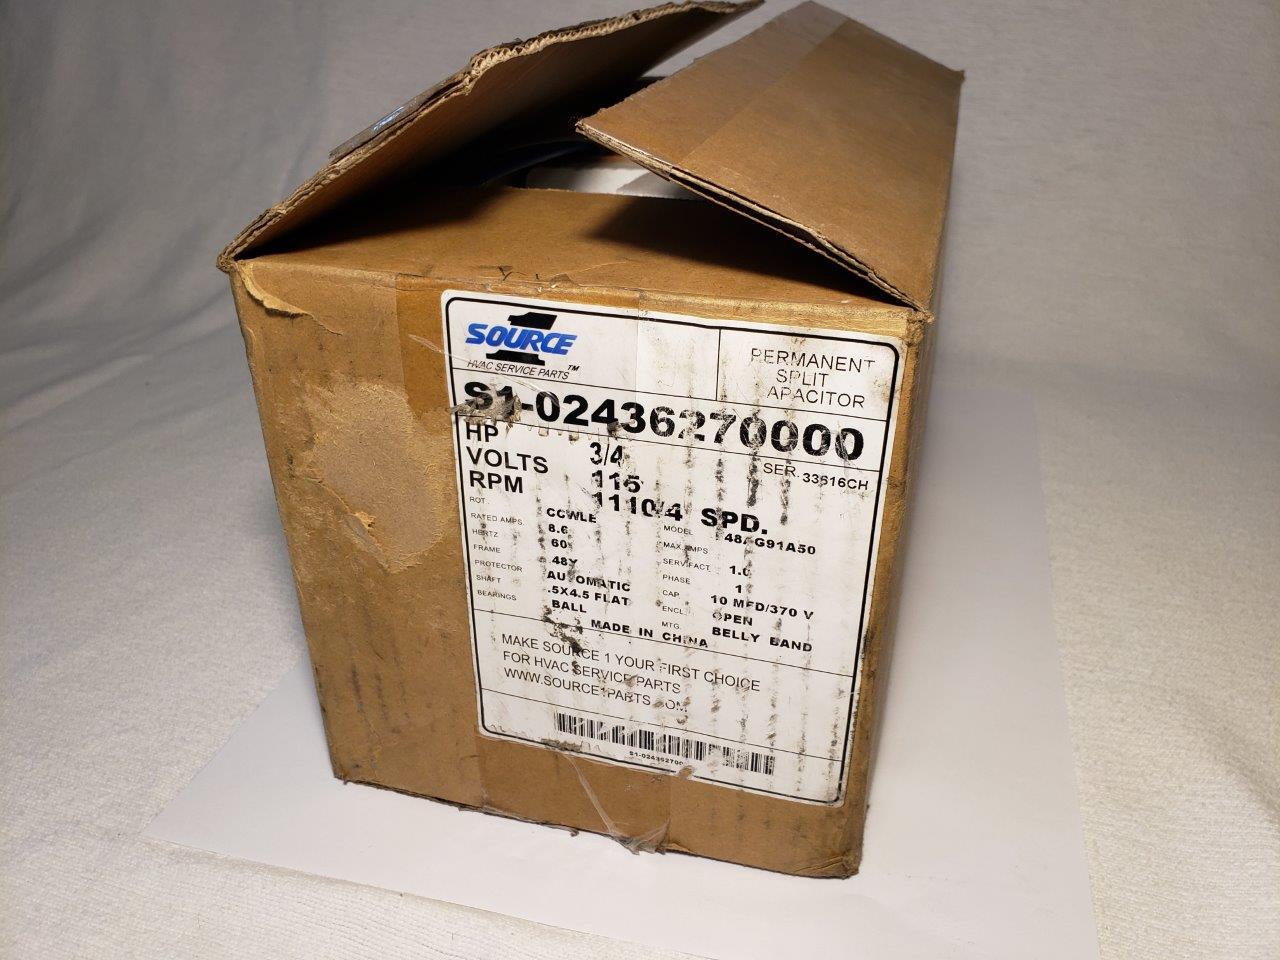 3/4 HP Furnace Blower Motor OEM York Coleman Luxaire Condenser Fan S1-02436270000